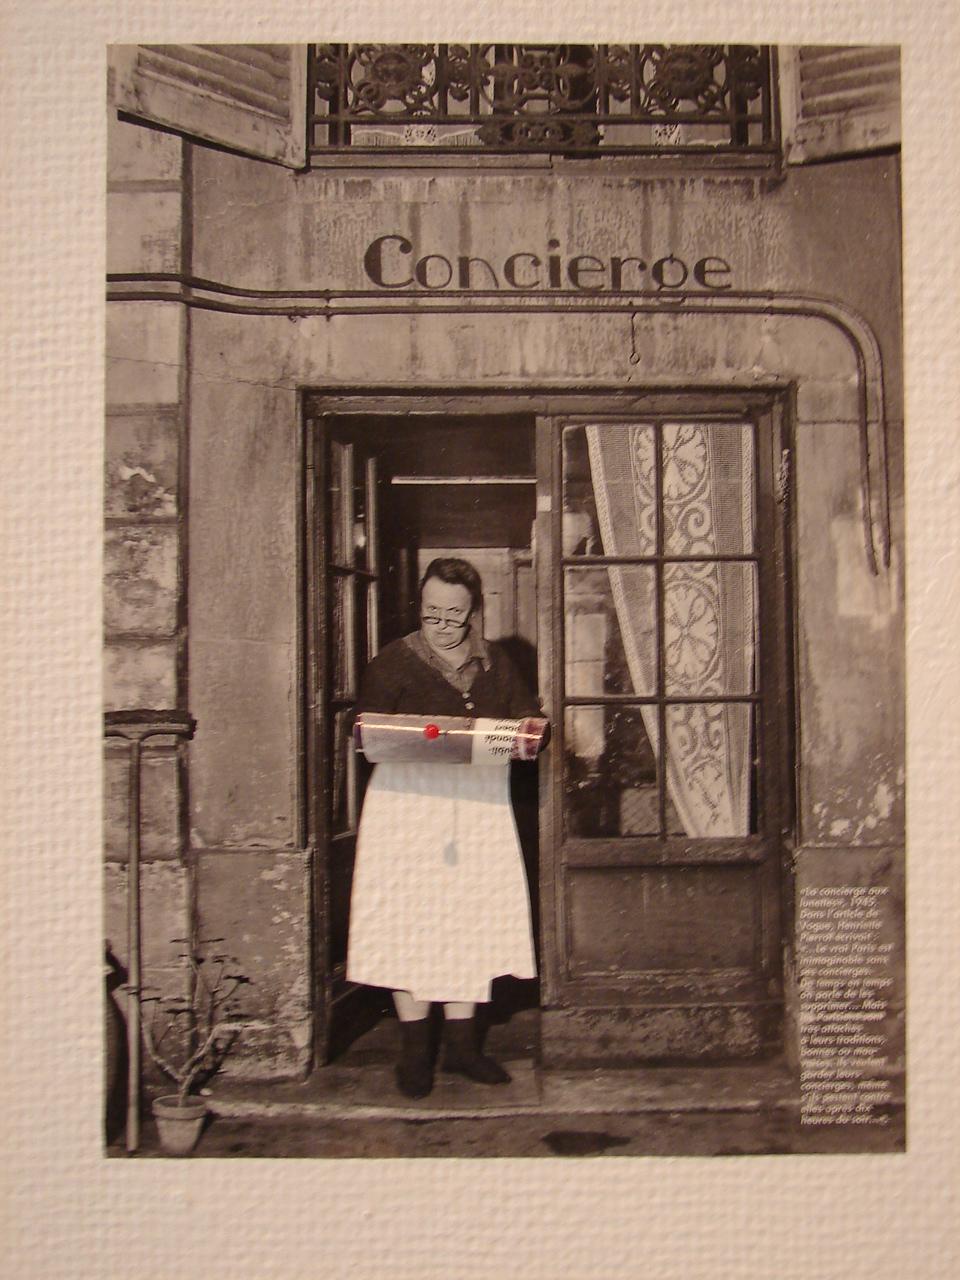 Femme sardine: la Concierge